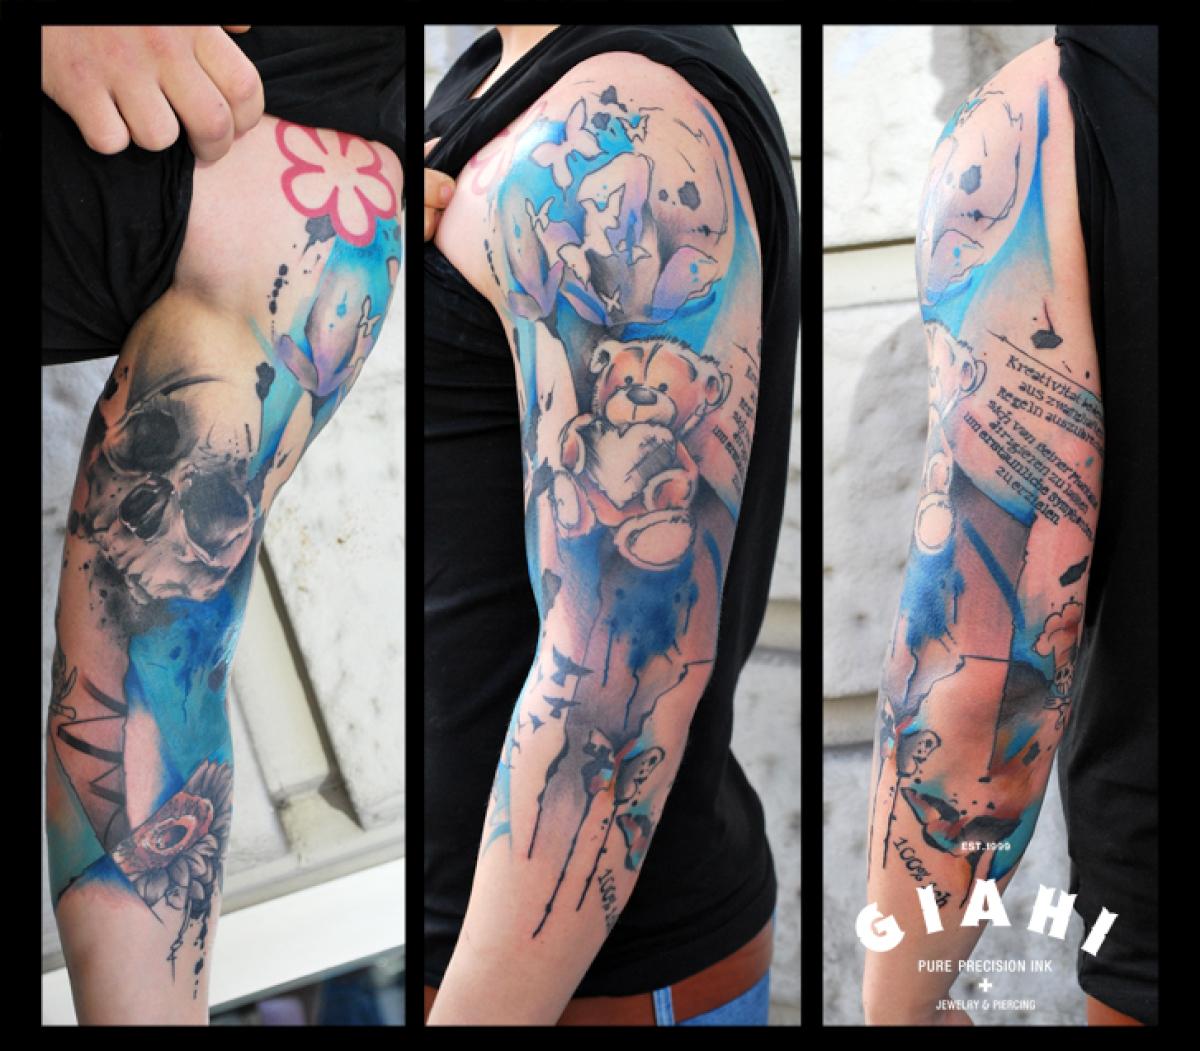 Skull Teddy Bear tattoo by Live Two | Best Tattoo Ideas Gallery